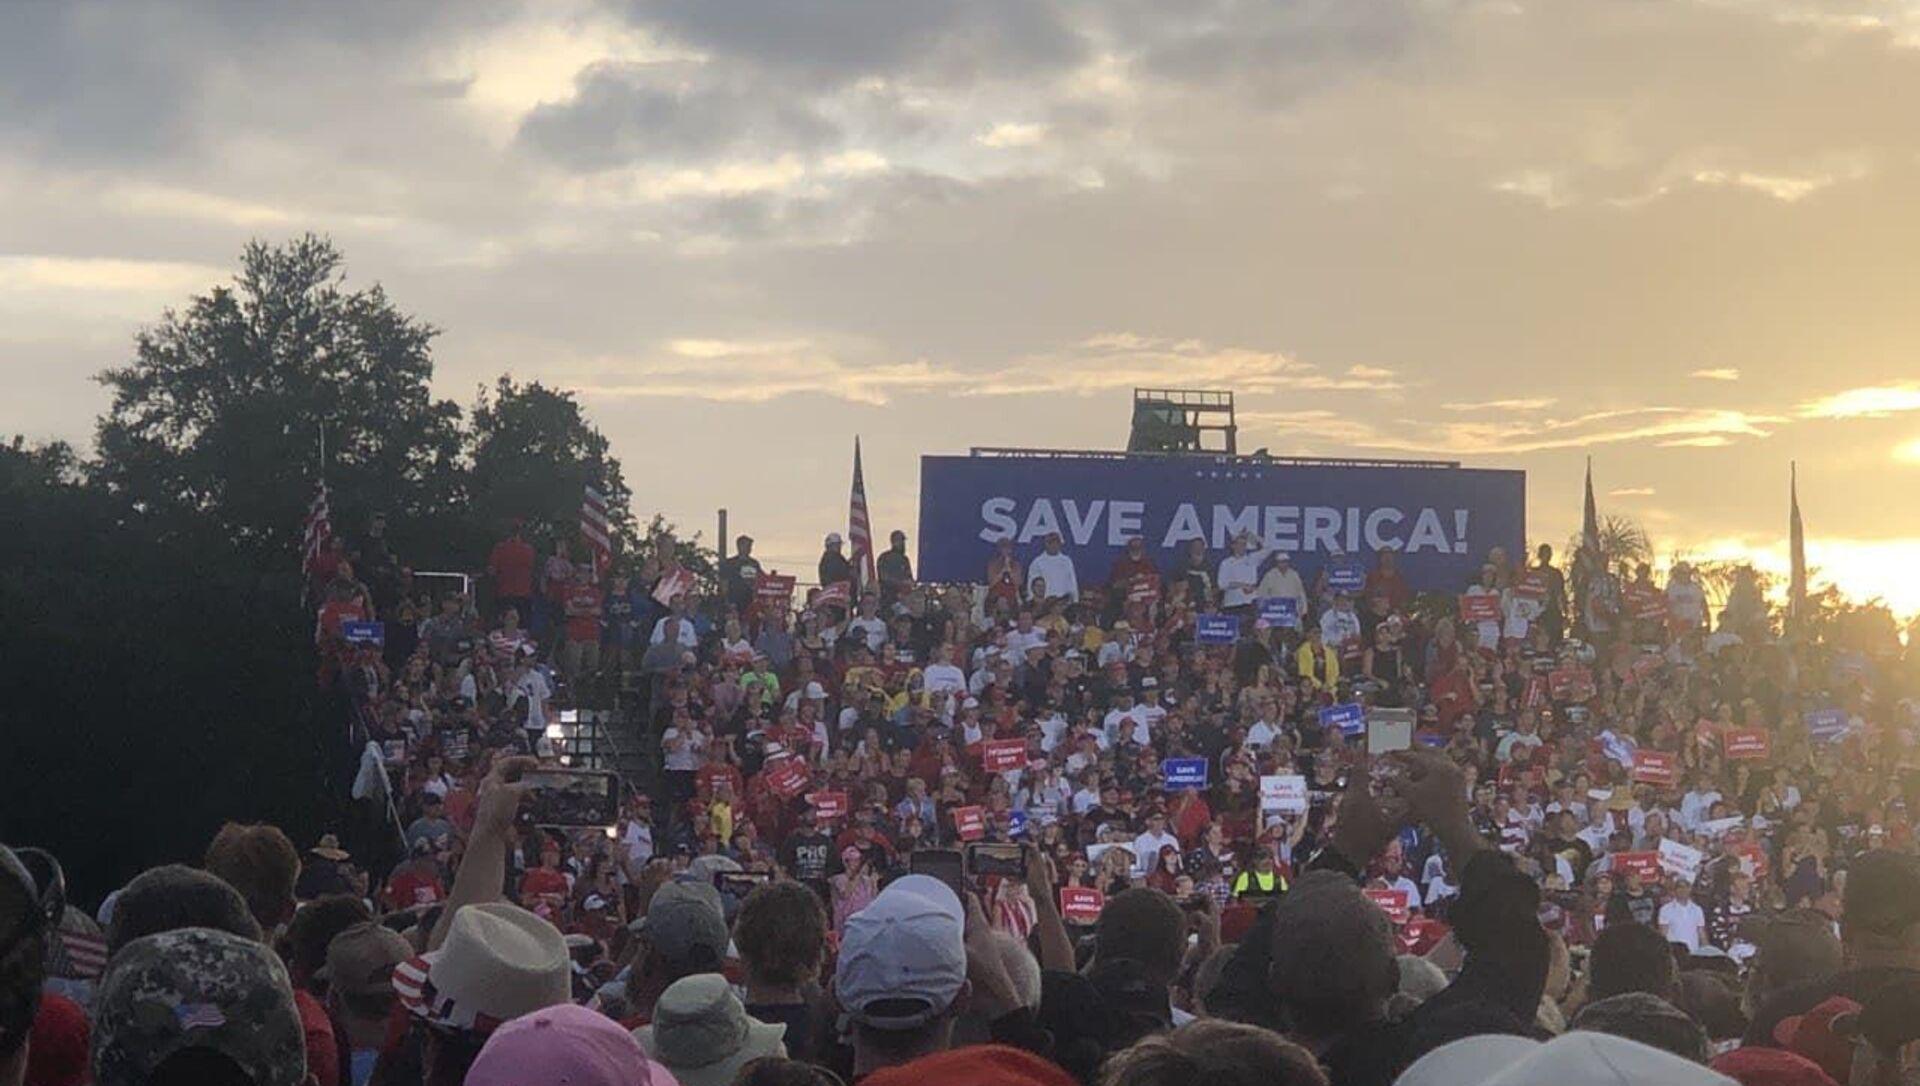 Donald Trump's  'Save America' campaign-style rally in Sarasota, Florida, 3 June, 2021 - Sputnik International, 1920, 04.07.2021